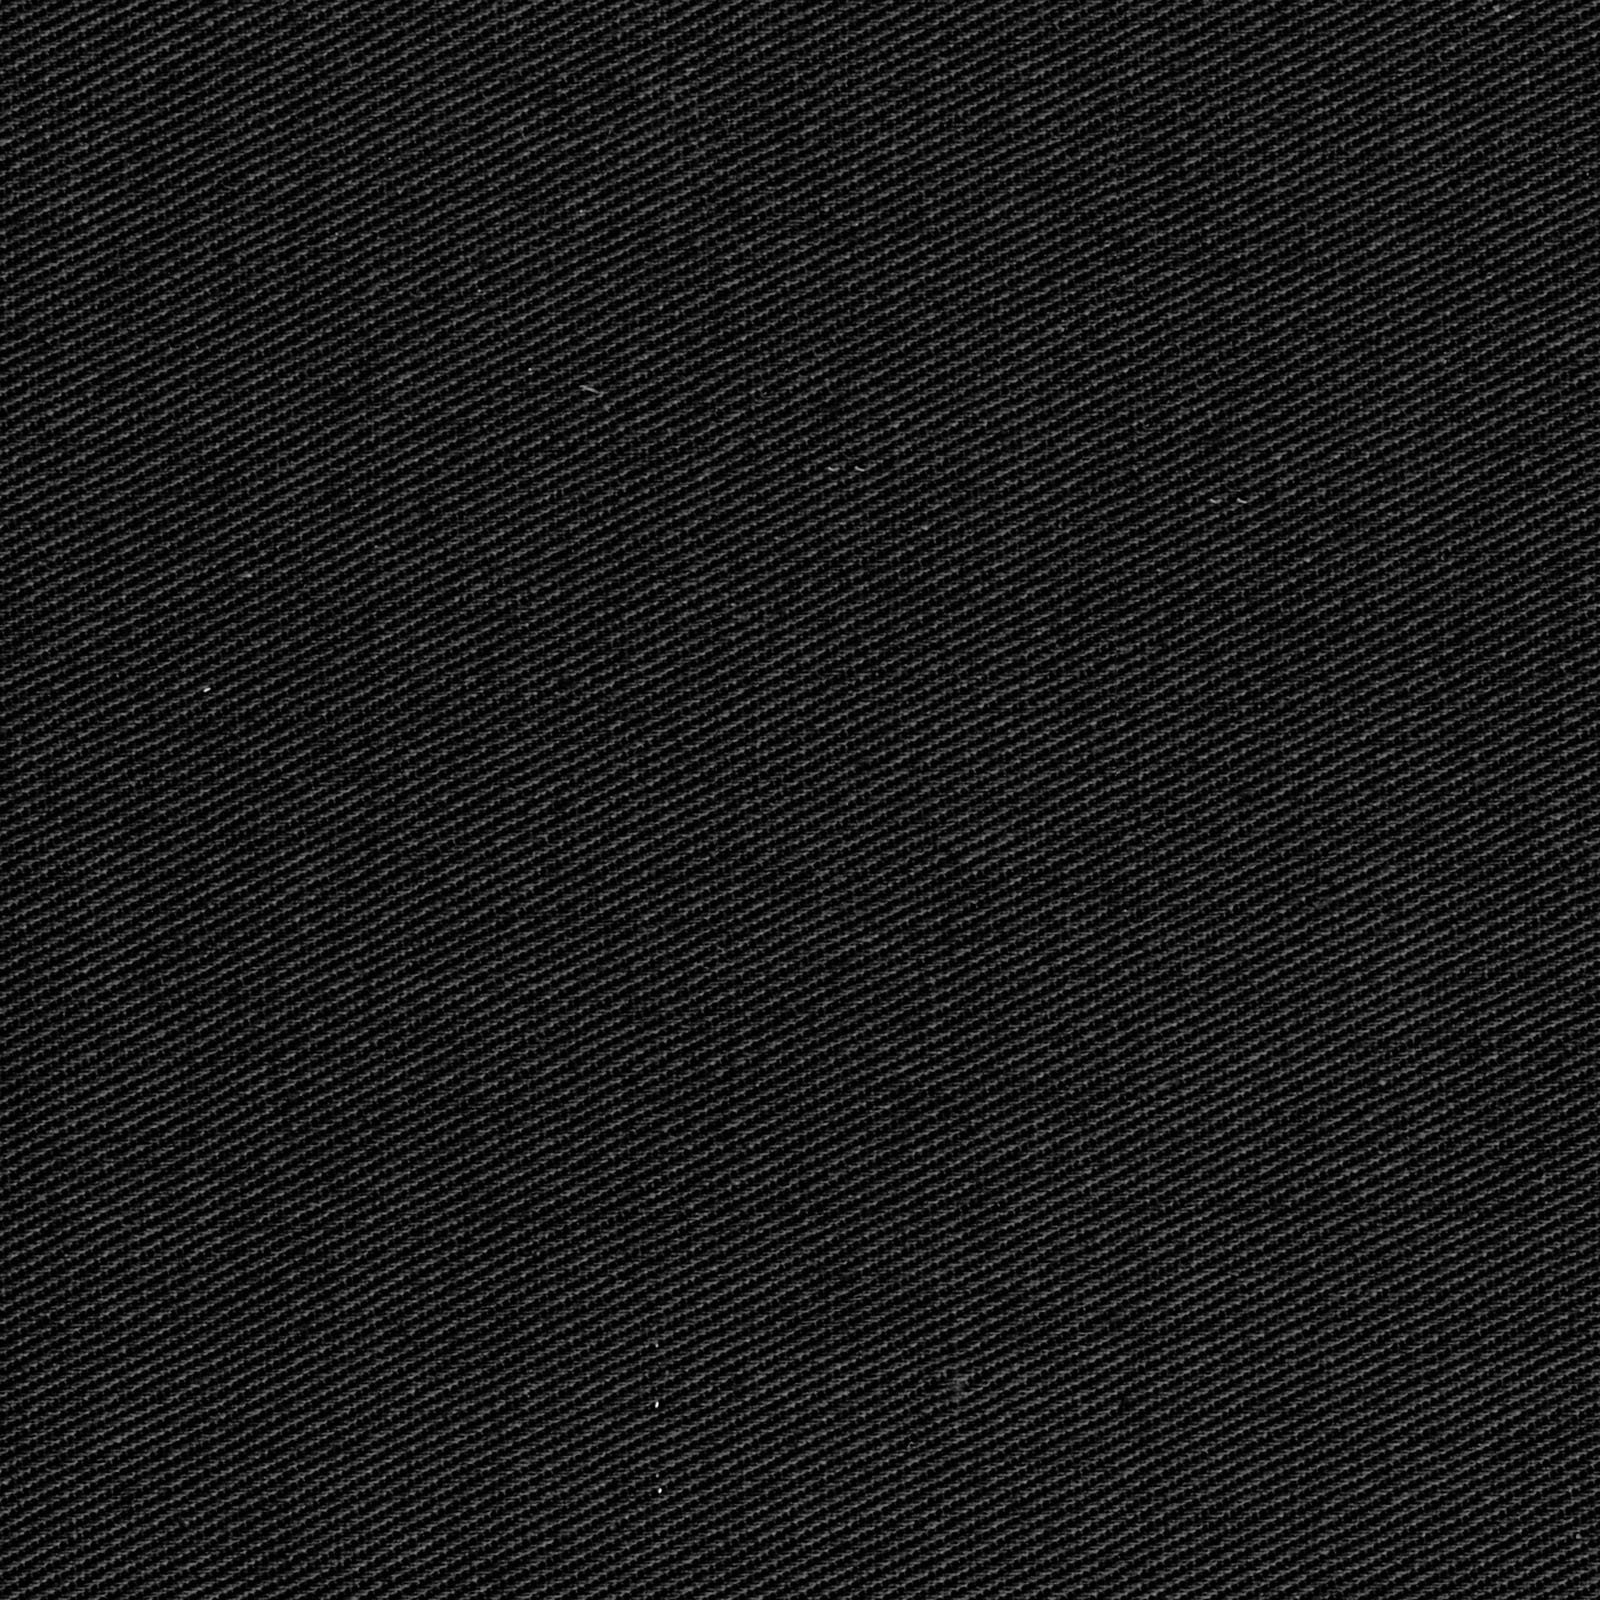 Bull Denim - Black<br/>David Textiles 1275-1J-1